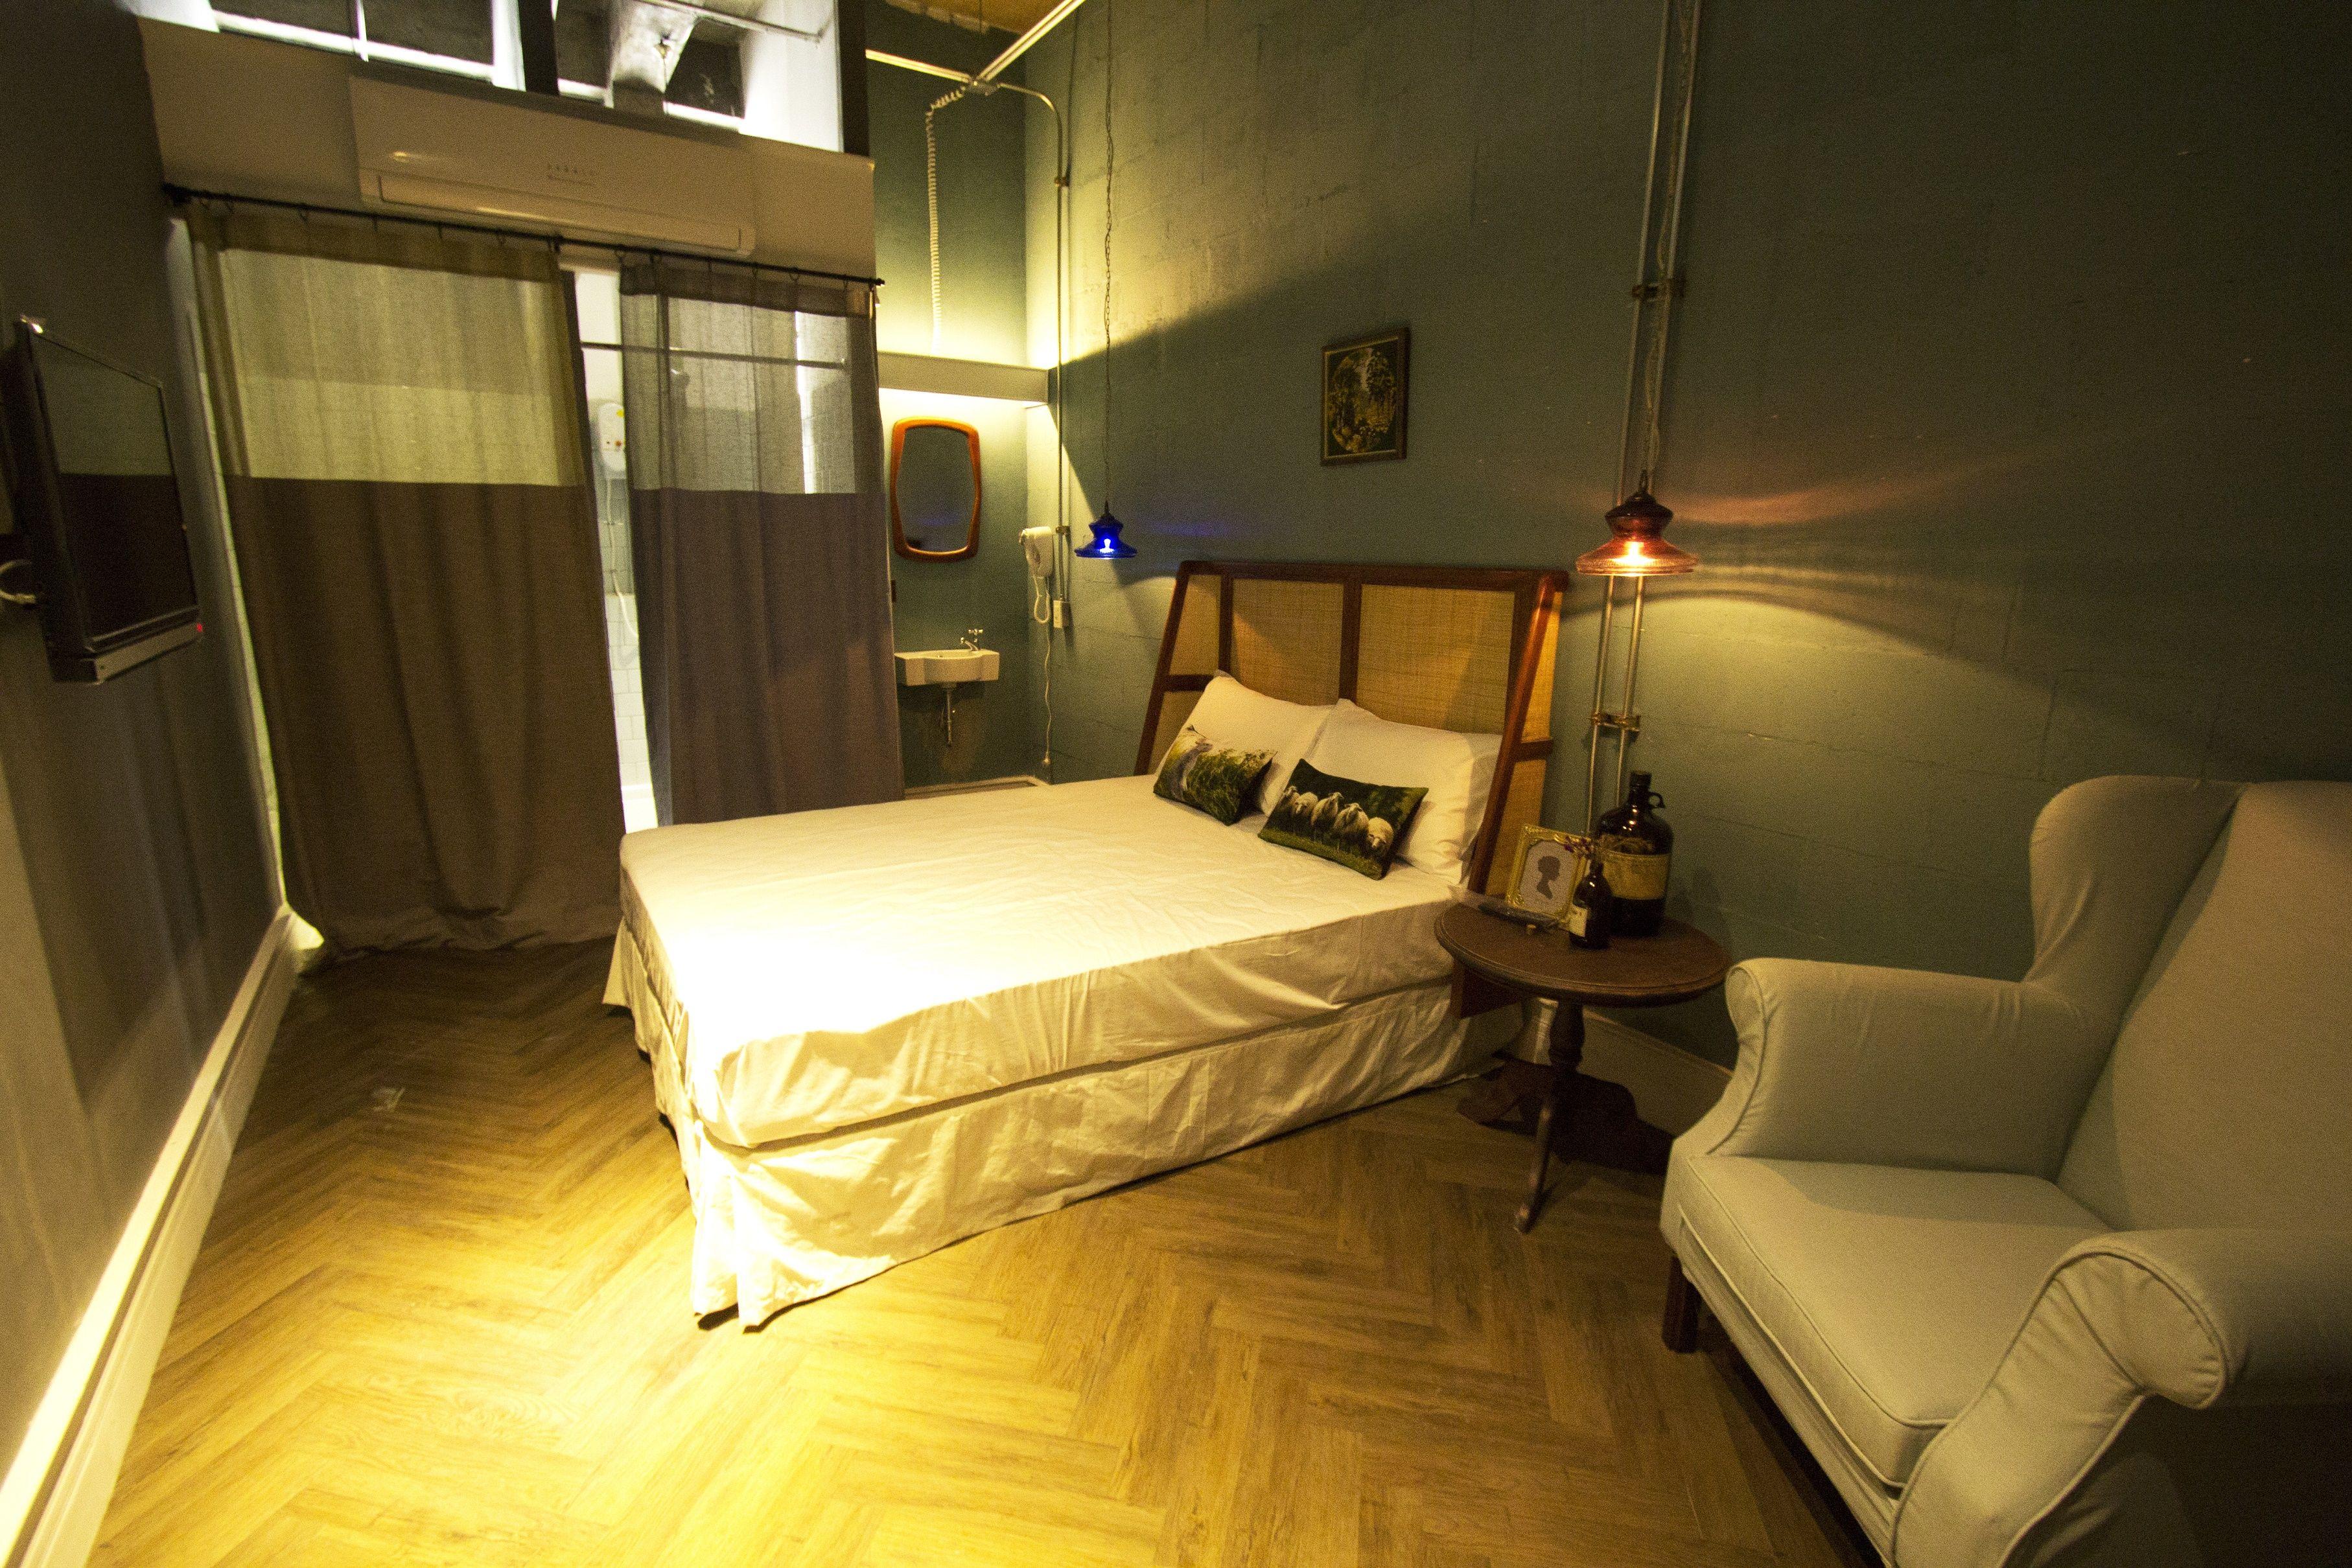 Industrial Vintage Loft Inspired - ONEDAY Hostel, new Bangkok Hostel |  ONEDAY l Pause & Forward : Hostel & Coworking Space in Bangkok | Pinterest  | Bangkok ...